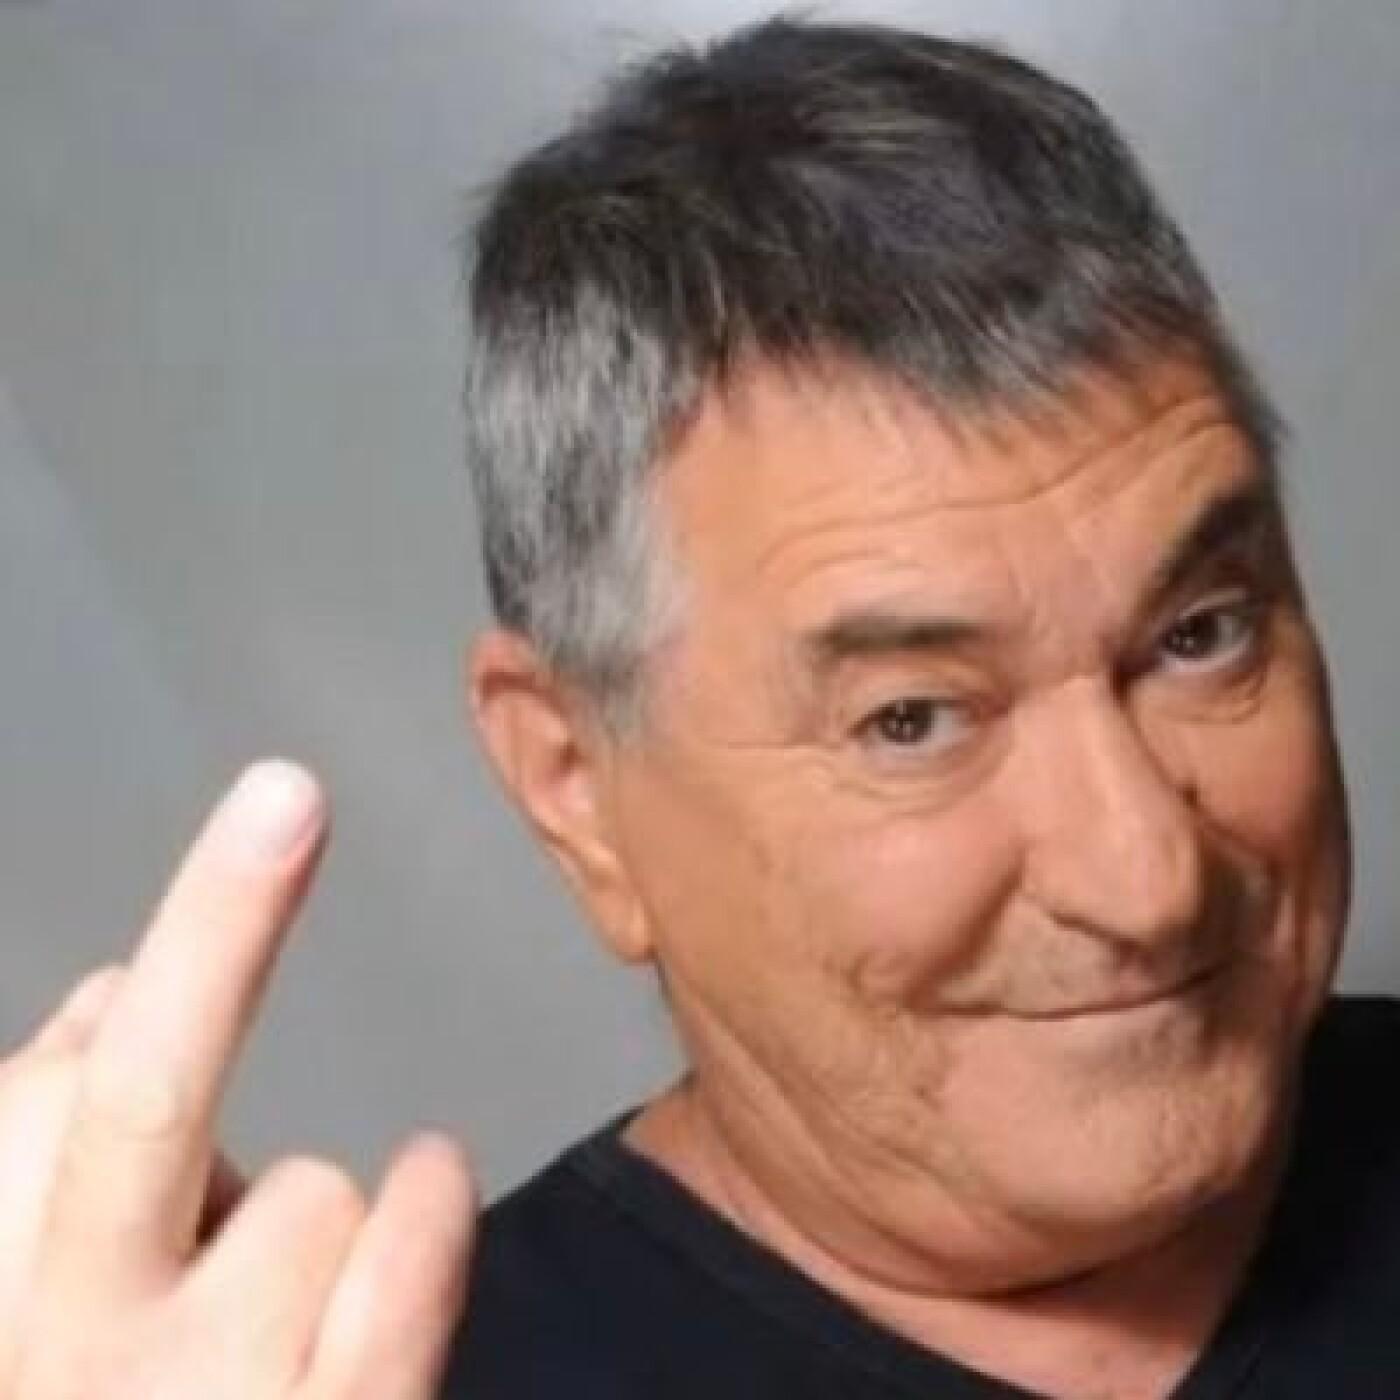 Humeur du jour, Bigard doit annuler son spectacle - 02 09 2021 - StereoChic Radio